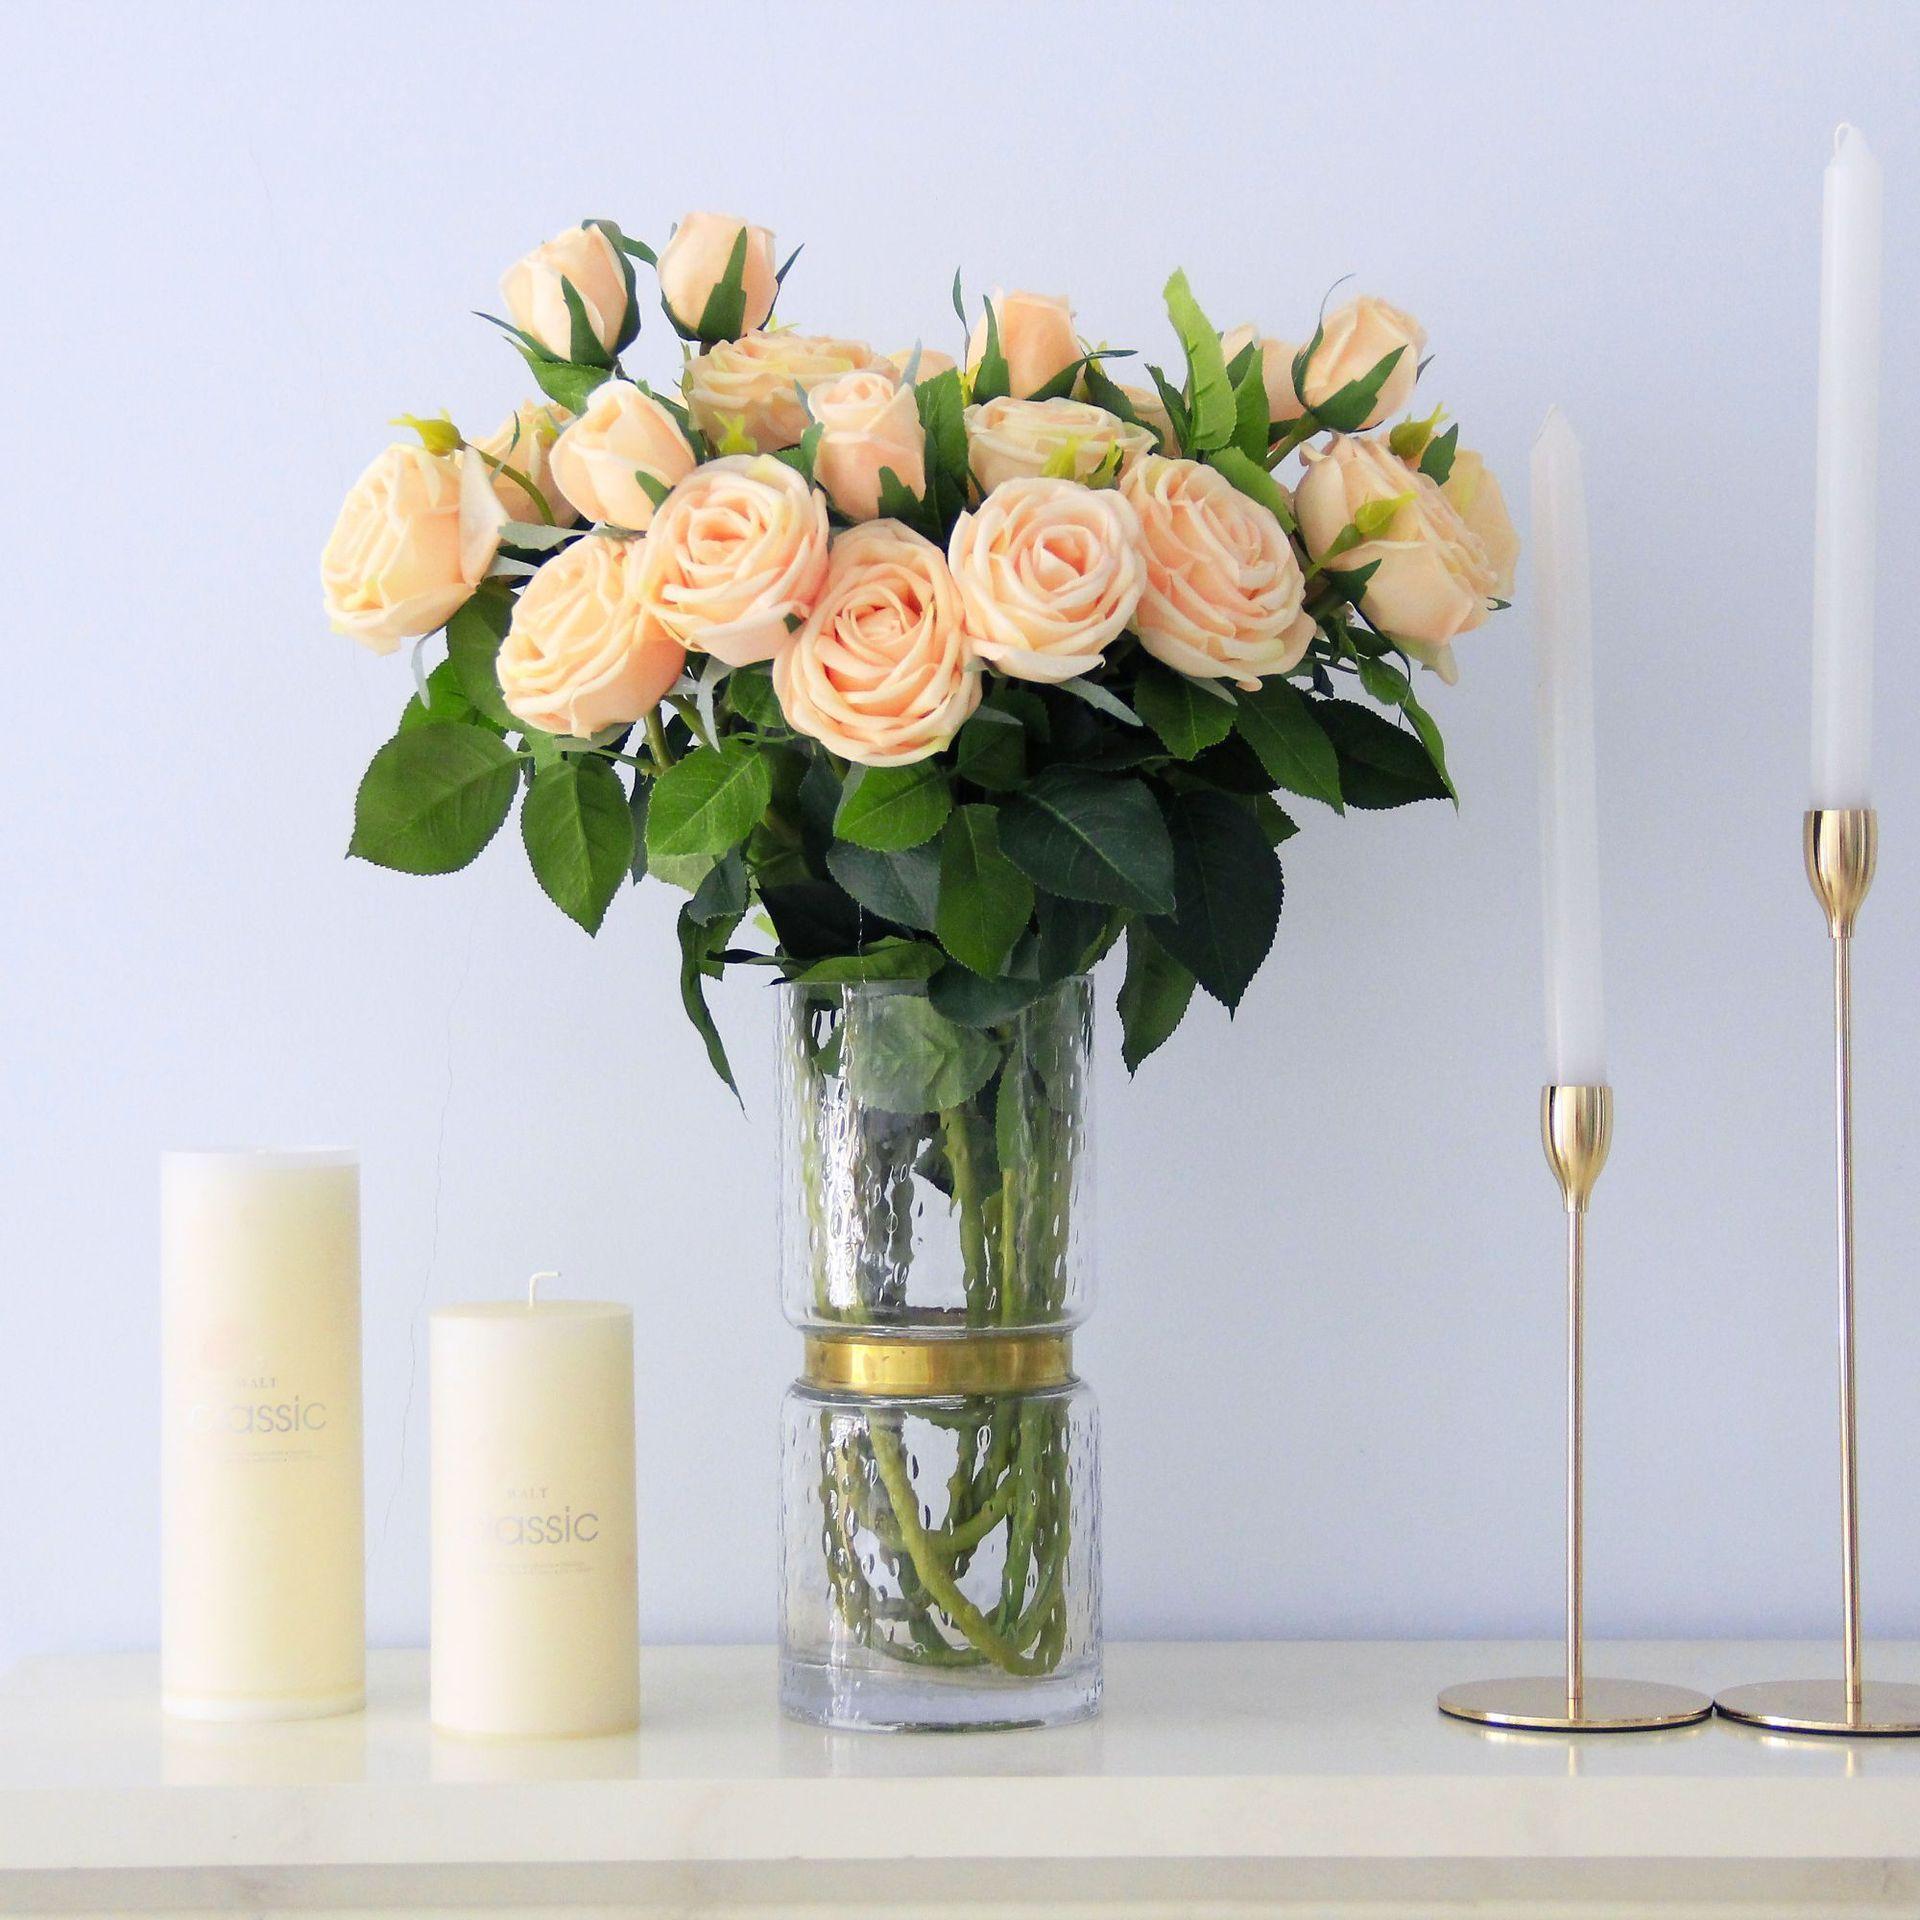 2019 71cm Wedding Decorations Flower Artificial Silk Rose Flower Head Home Party Handwork Diy Decor Simulation Flower Fake Flowers From Home Fashion